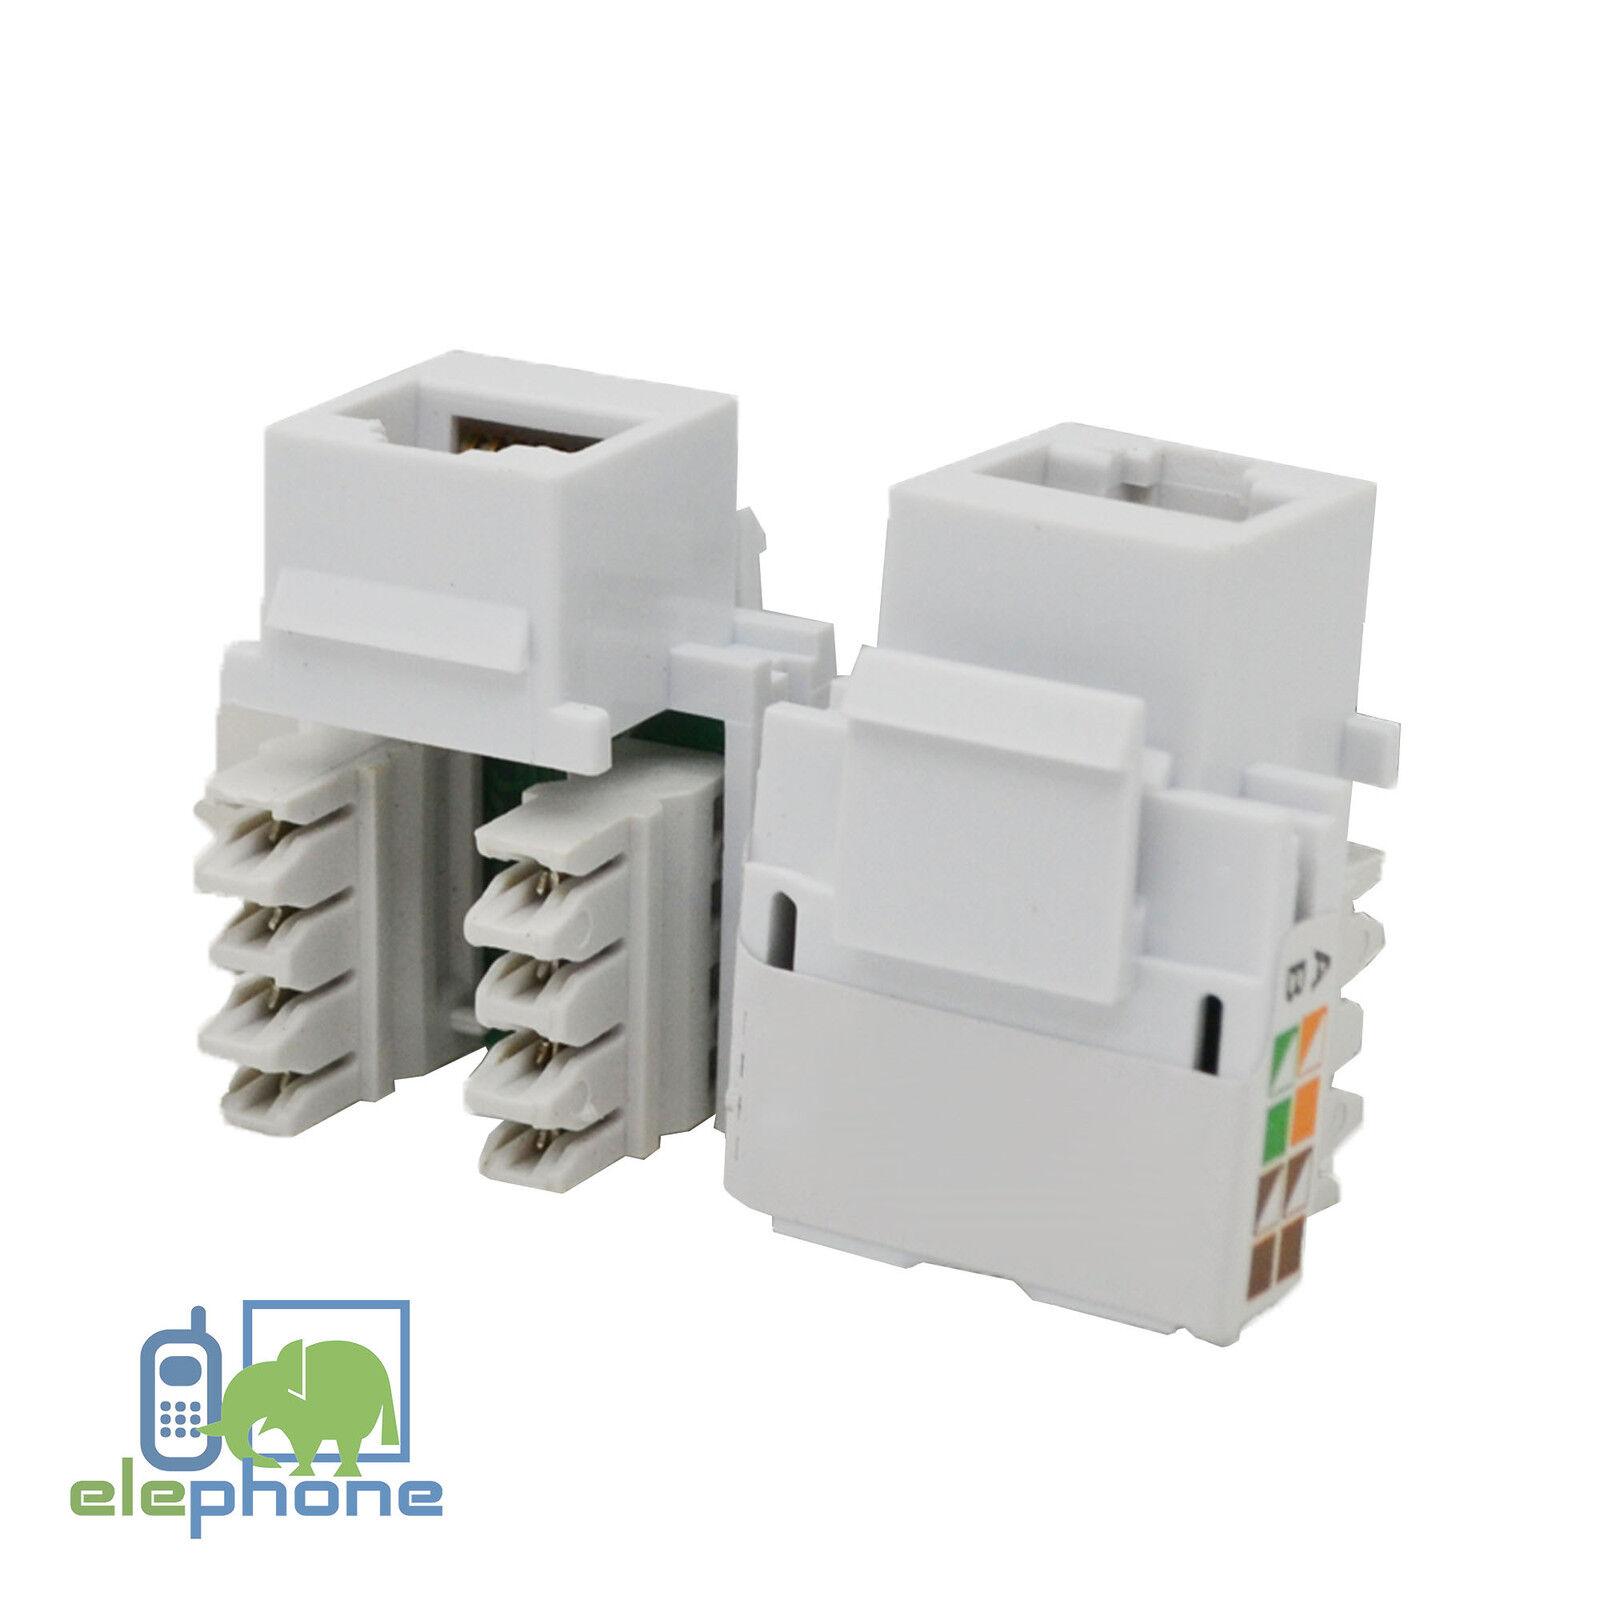 Rj45 Cat5e Ethernet Network Module Keystone Jack For Wall Face Plate Multi Lot